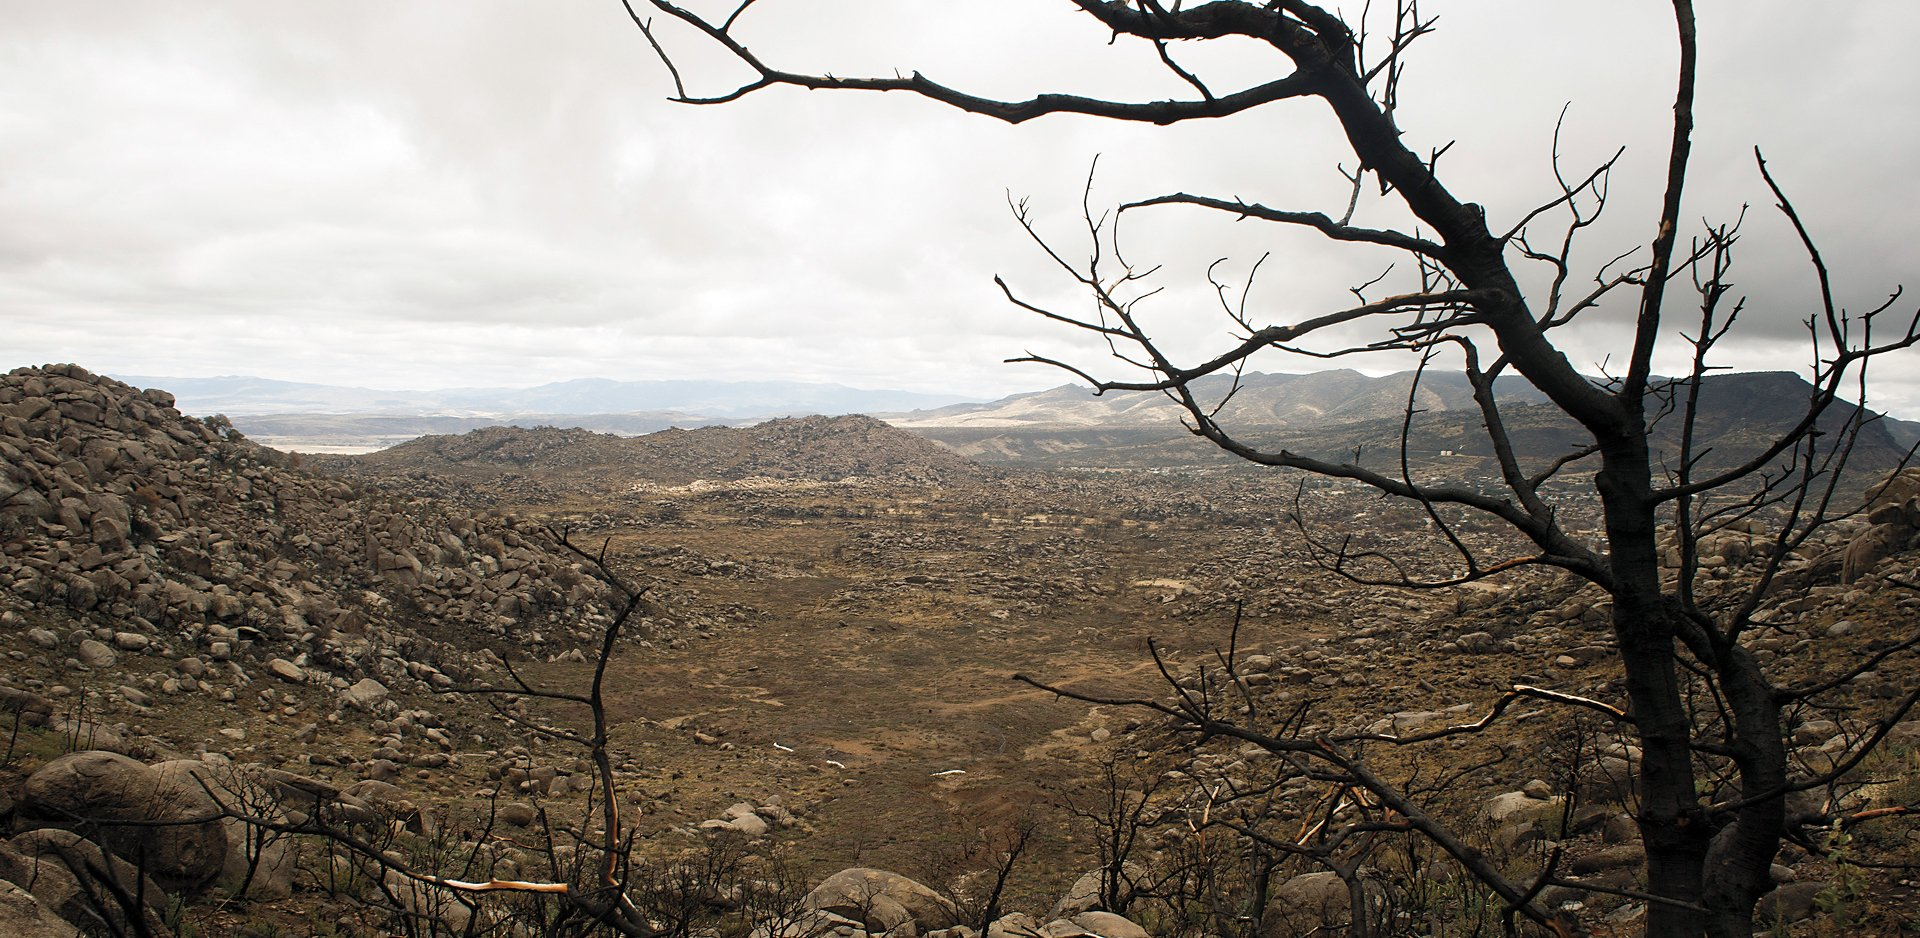 Arizona yavapai county yarnell - Most Popular